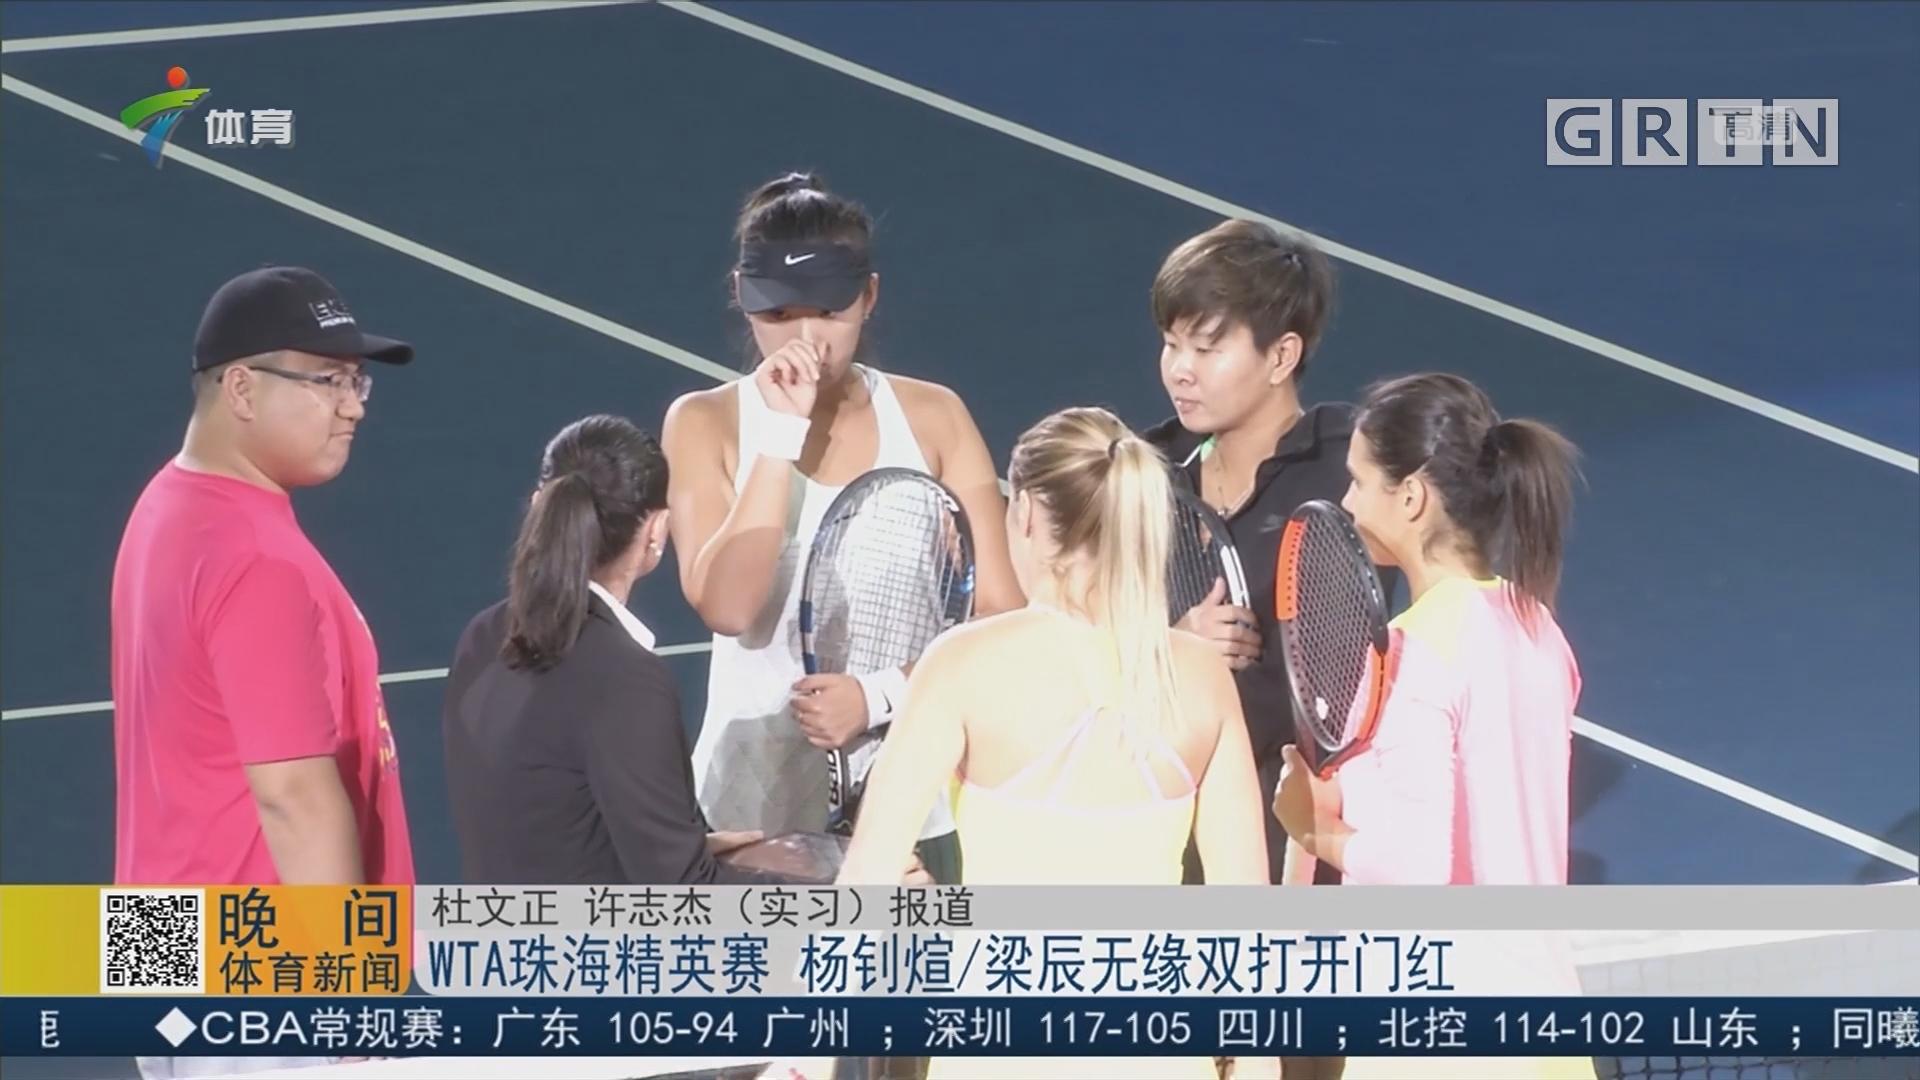 WTA珠海精英赛 杨钊煊/梁辰无缘双打开门红